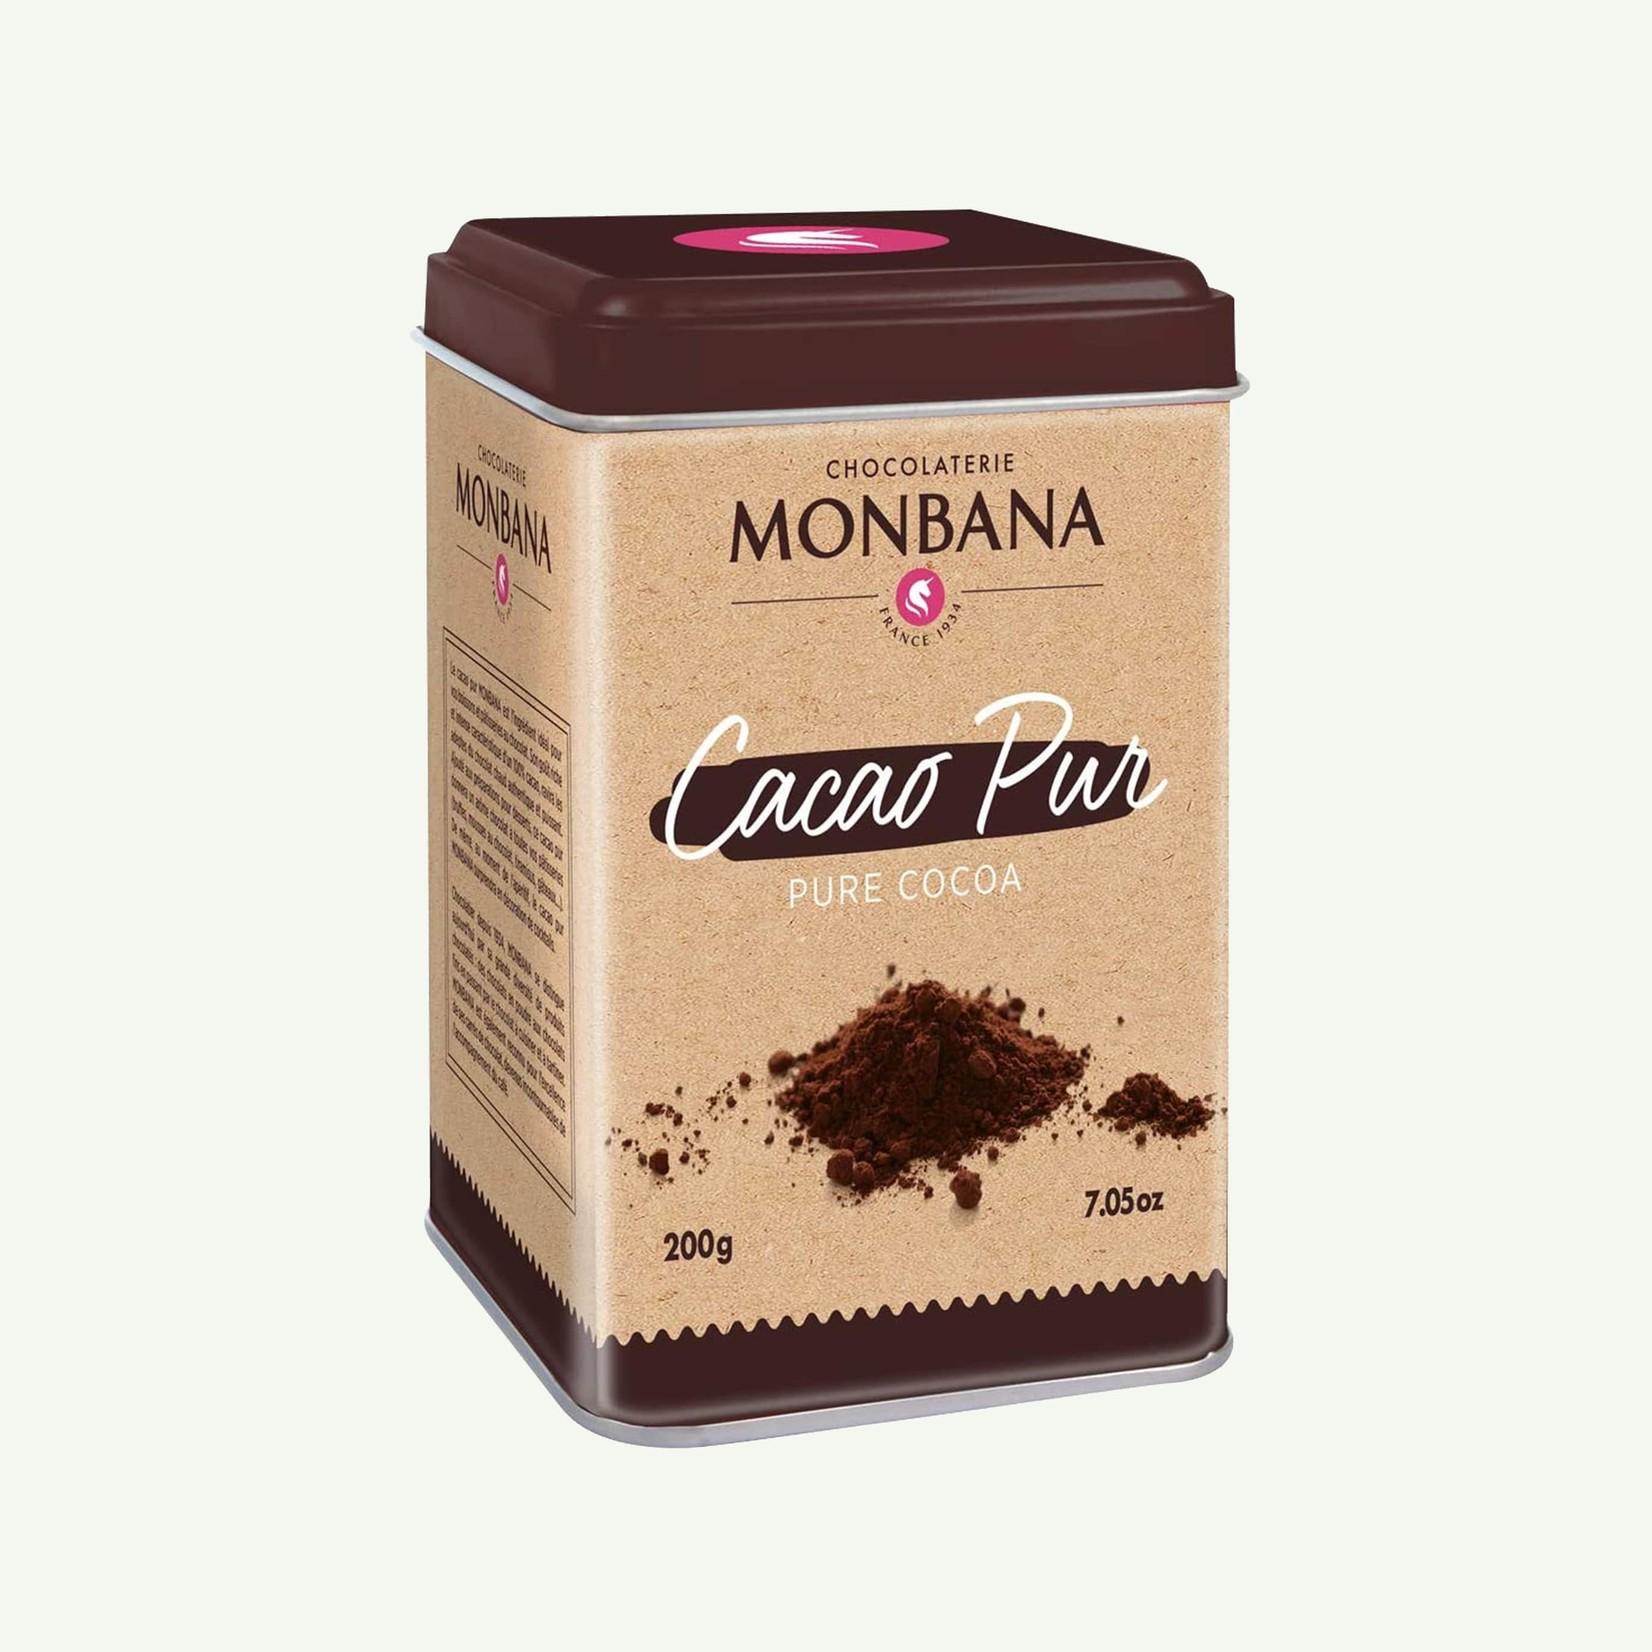 Monbana Monbana 'Cacao Pur' 200g